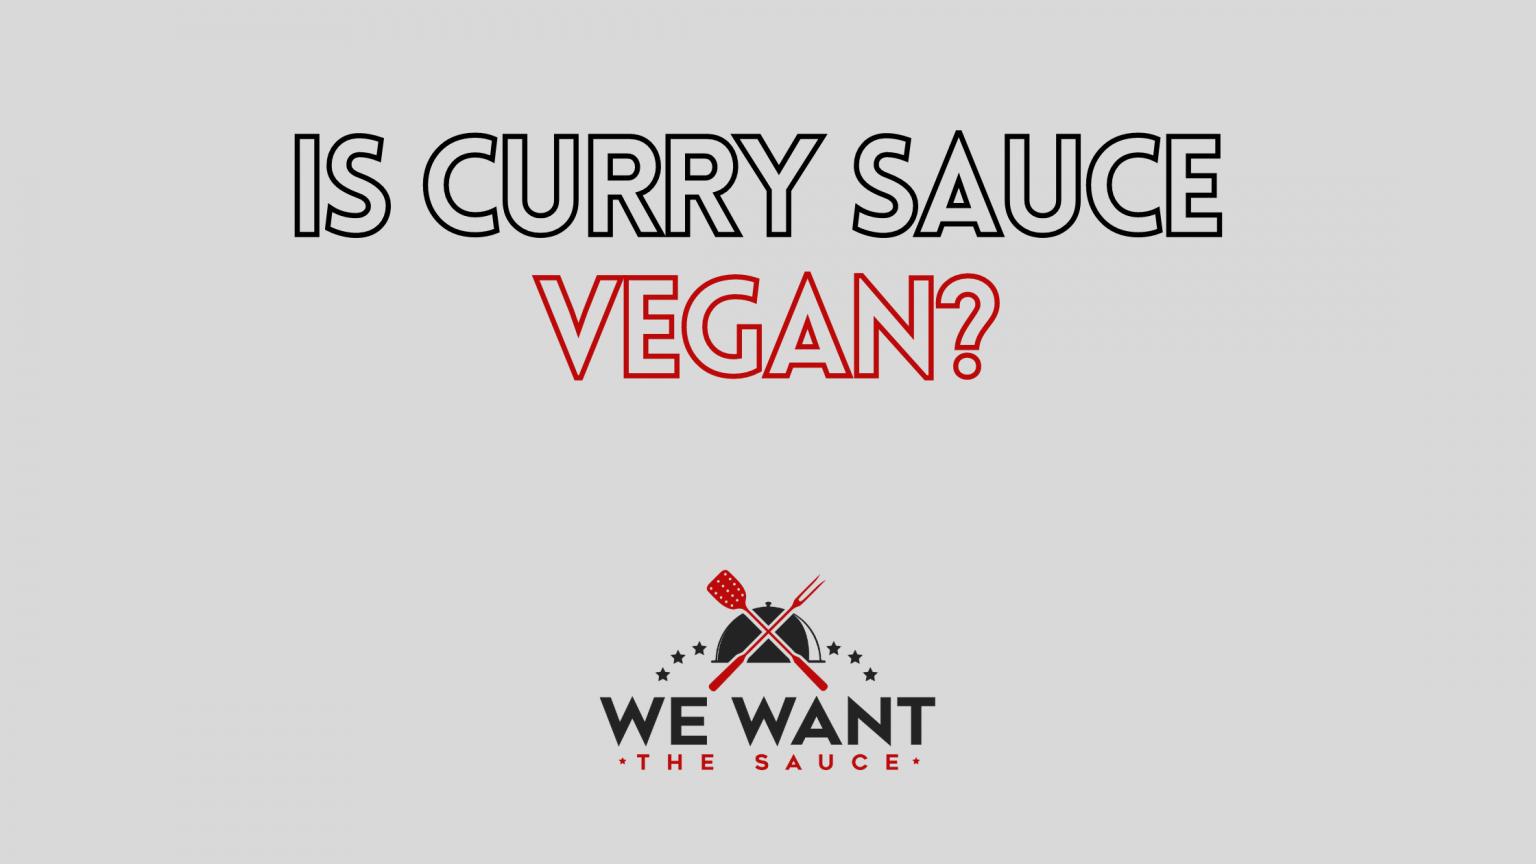 Is Curry Sauce Vegan?